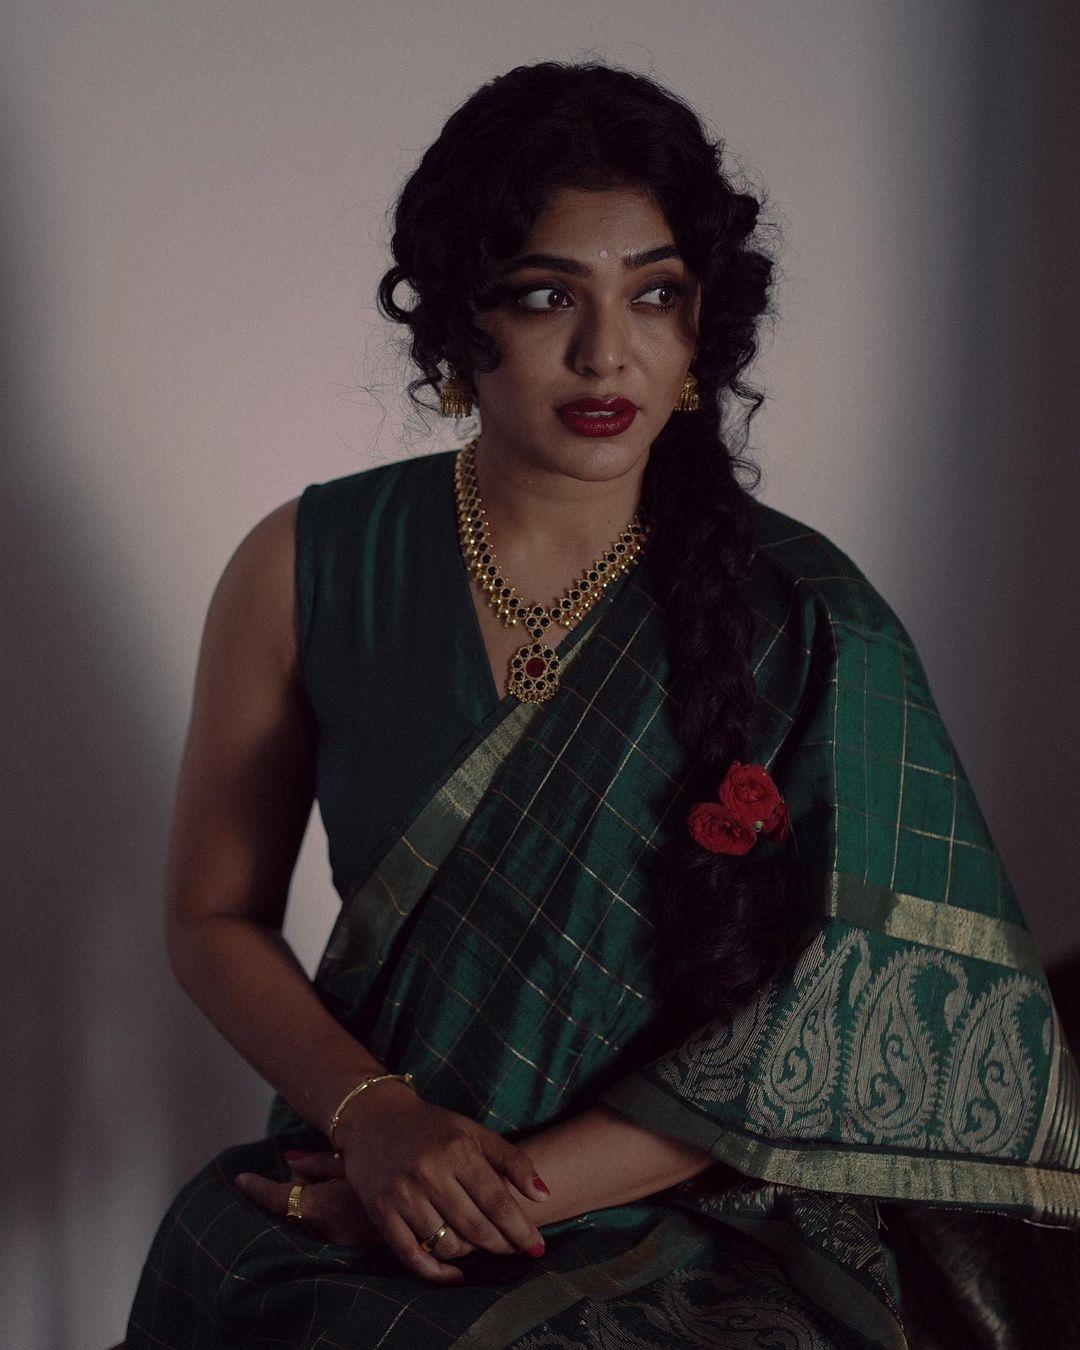 rima Kallingal neelavelicham movie poster